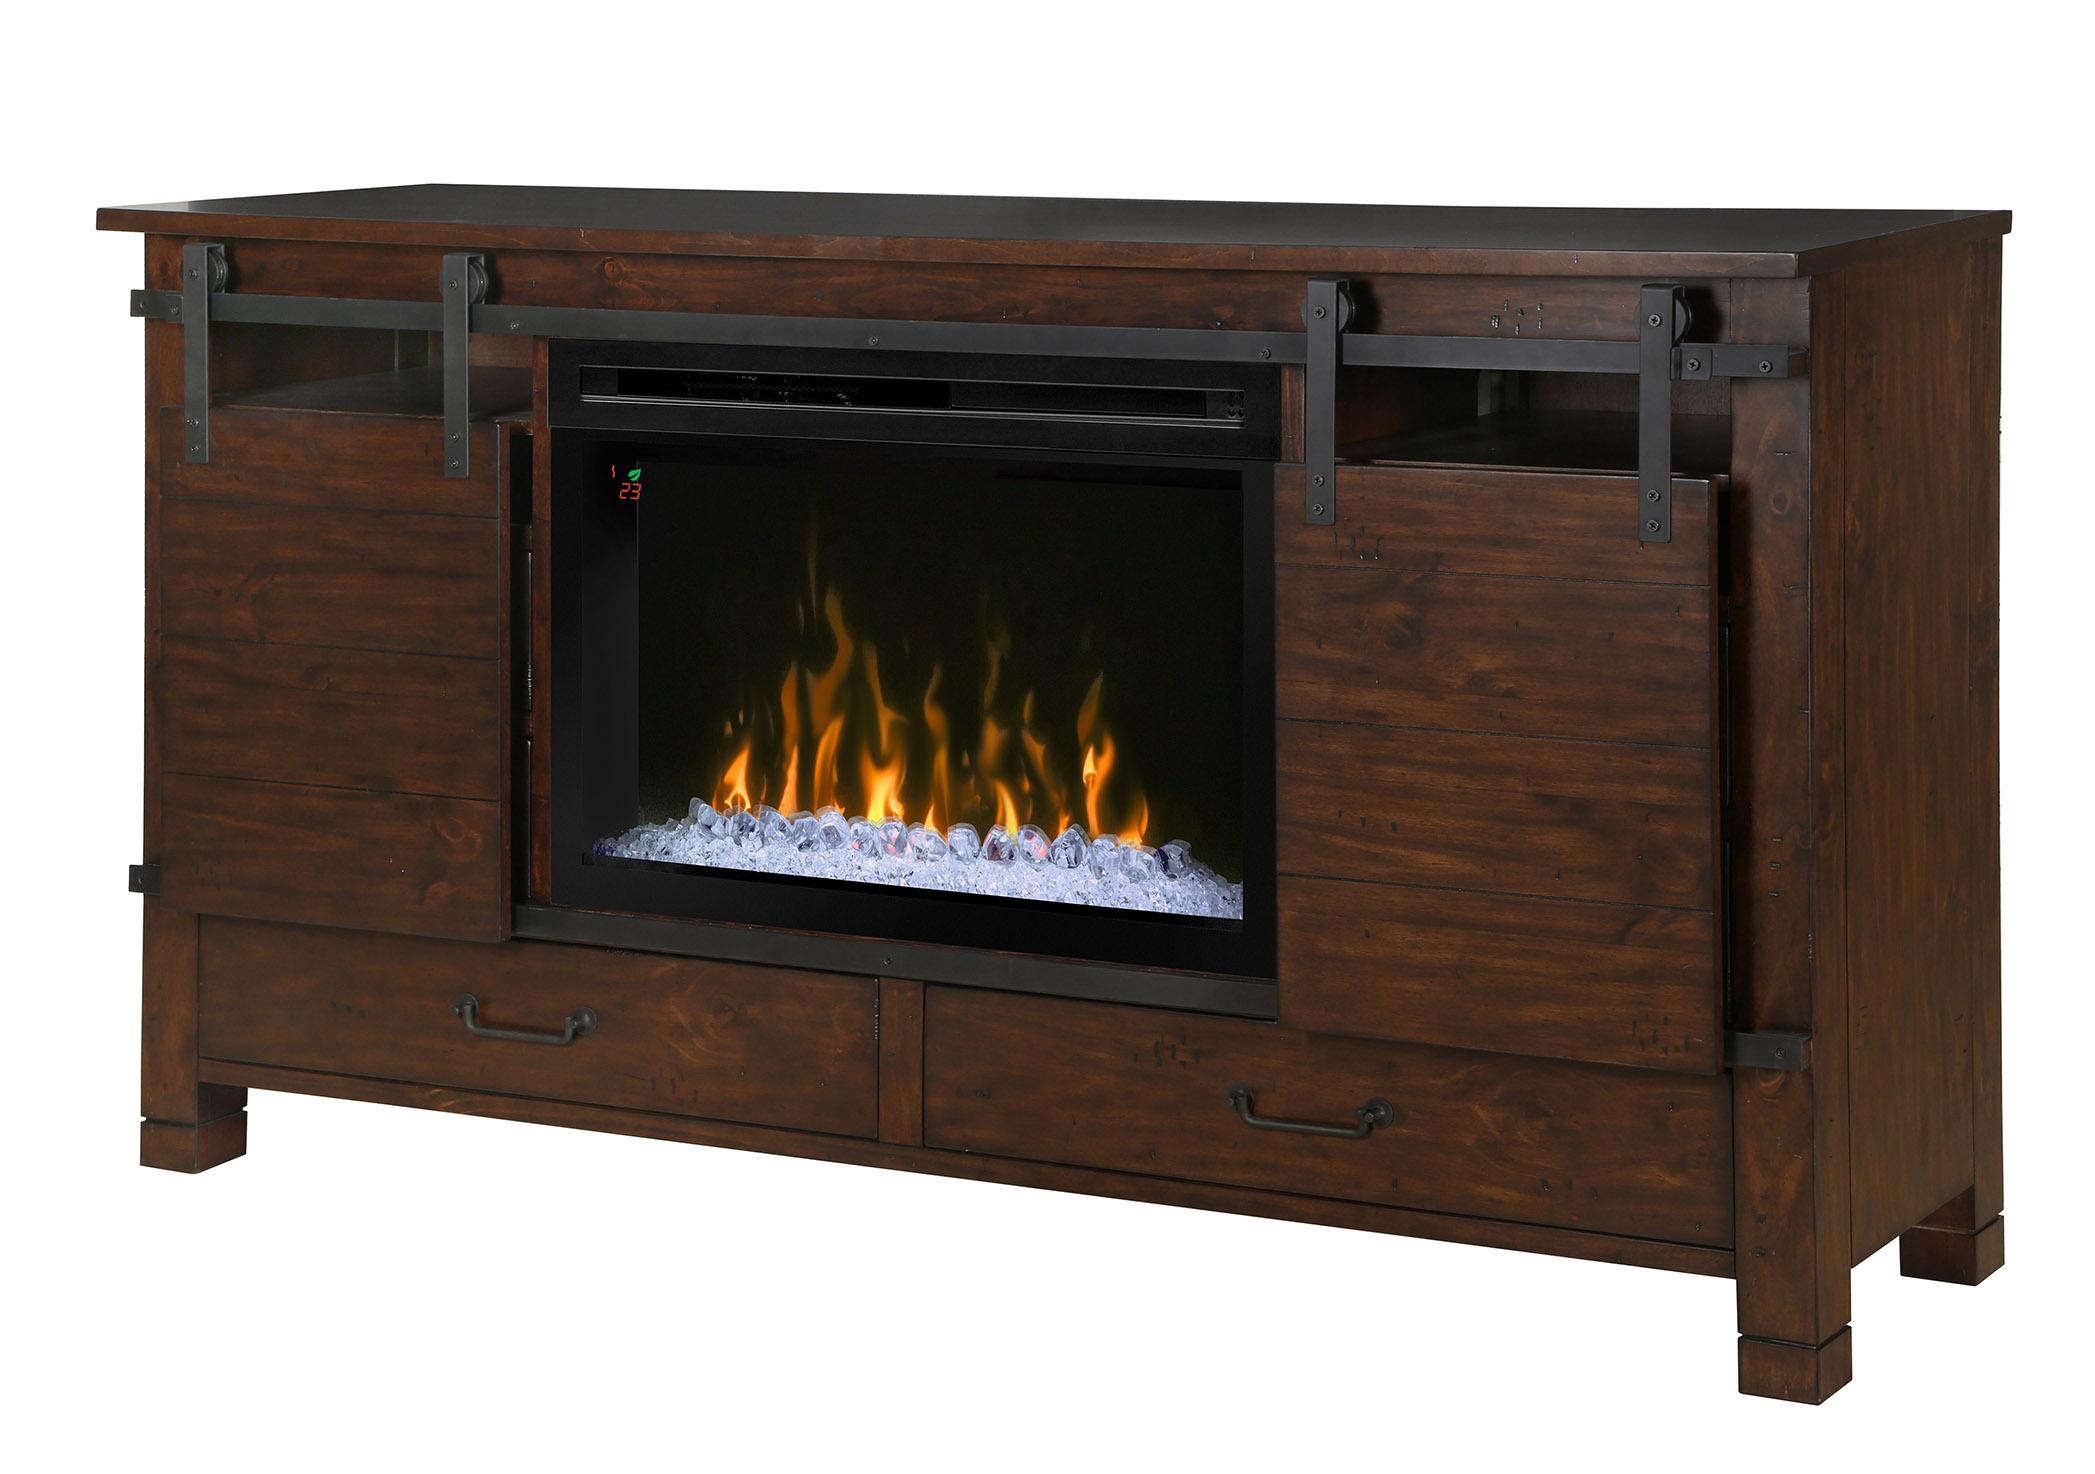 Dimplex Austin Media Console Electric Fireplace Gds33ld